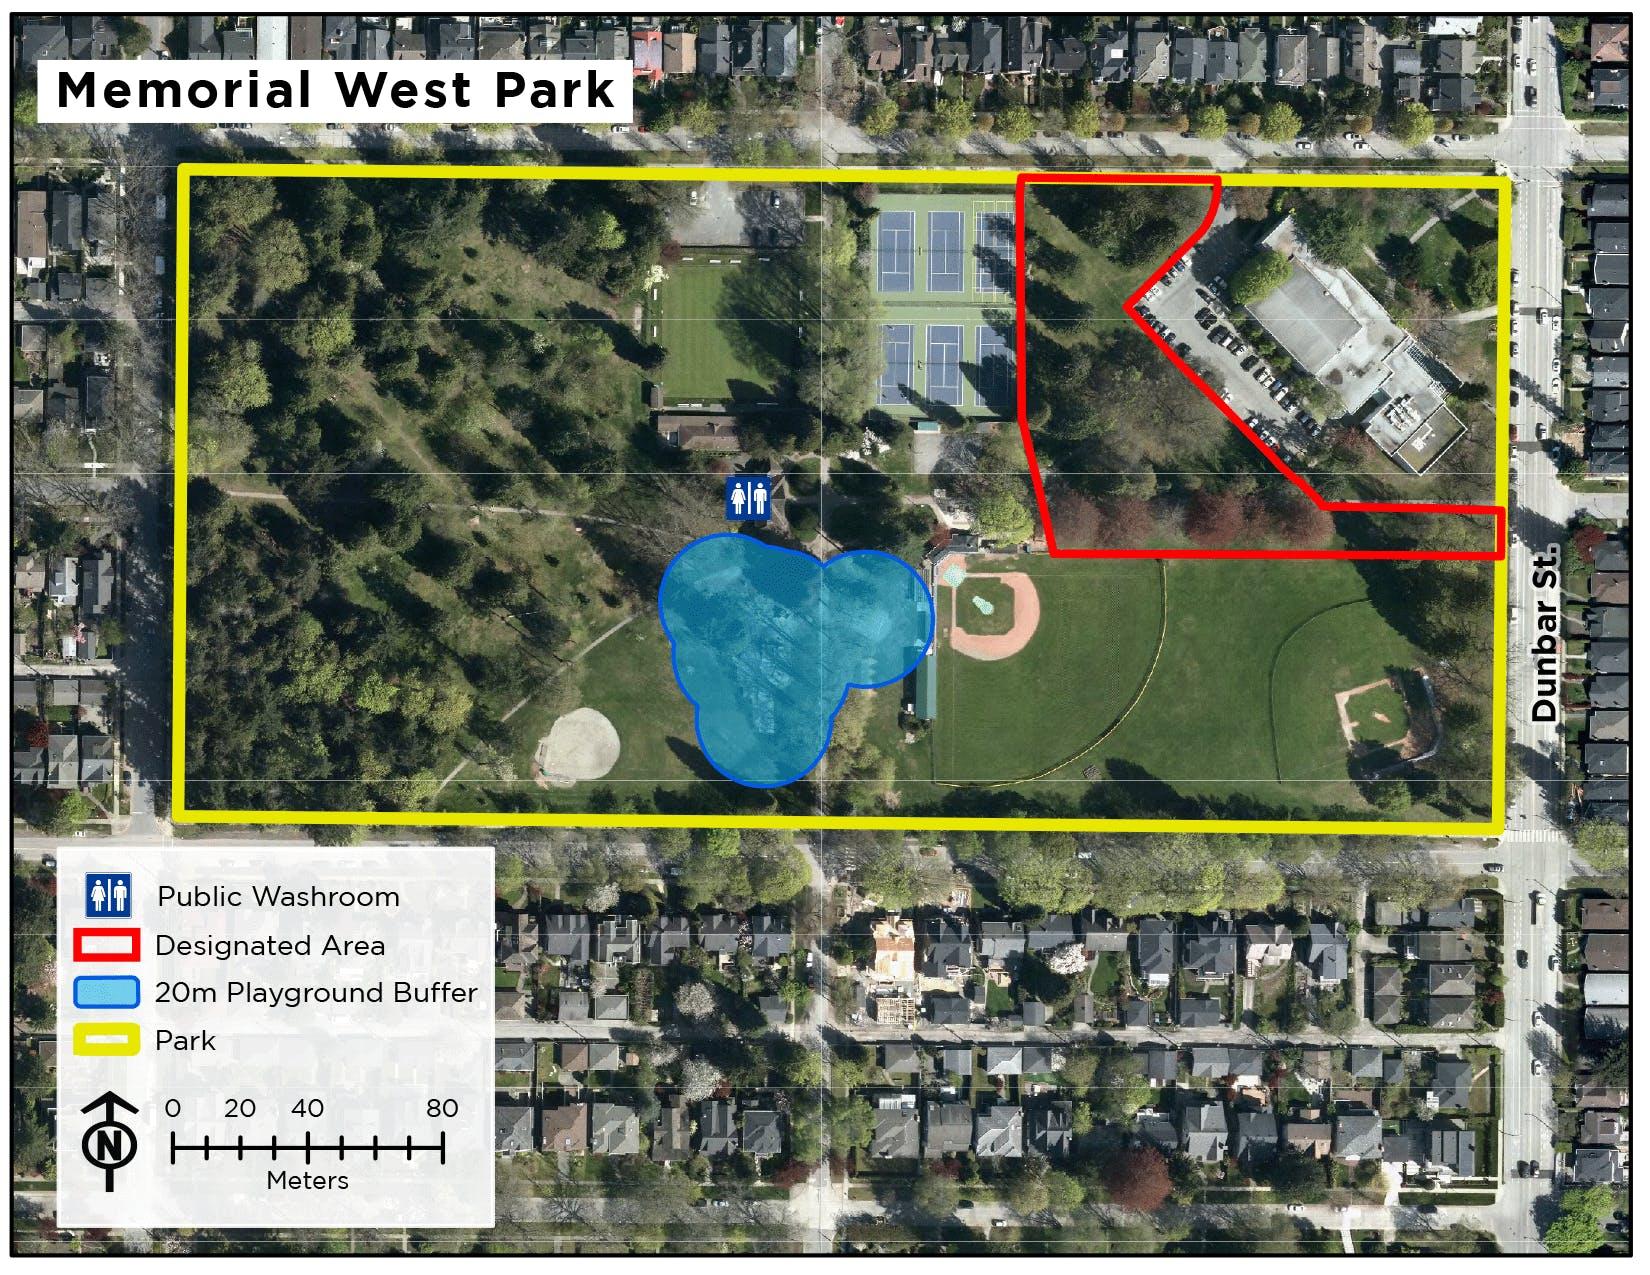 Memorial West Park